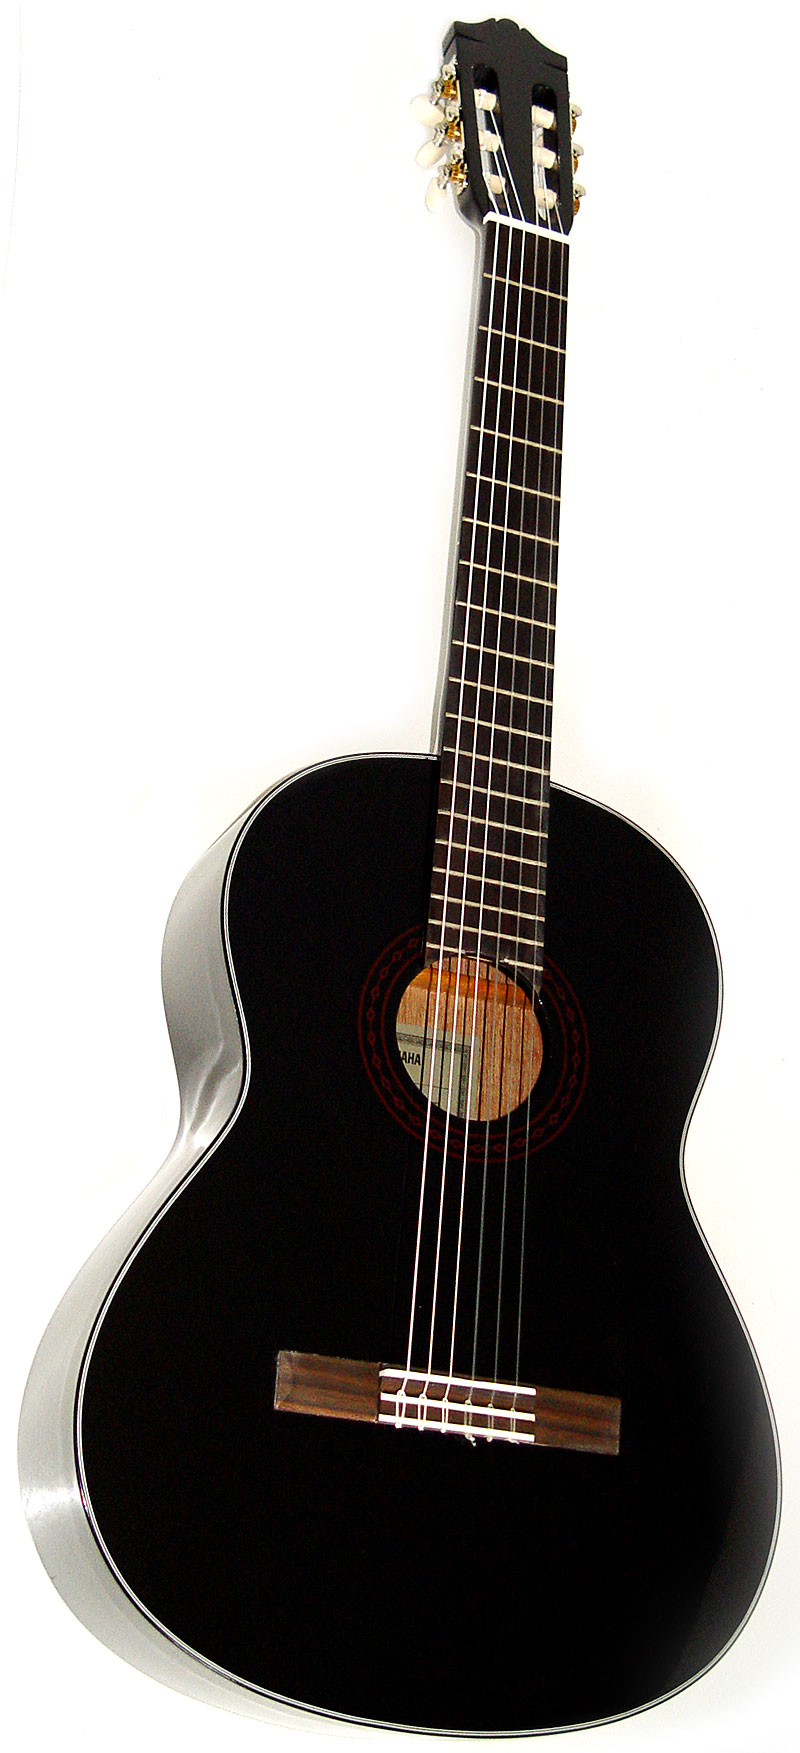 yamaha c40 bl konzert gitarre 4 4 schwarz gitarre bass. Black Bedroom Furniture Sets. Home Design Ideas